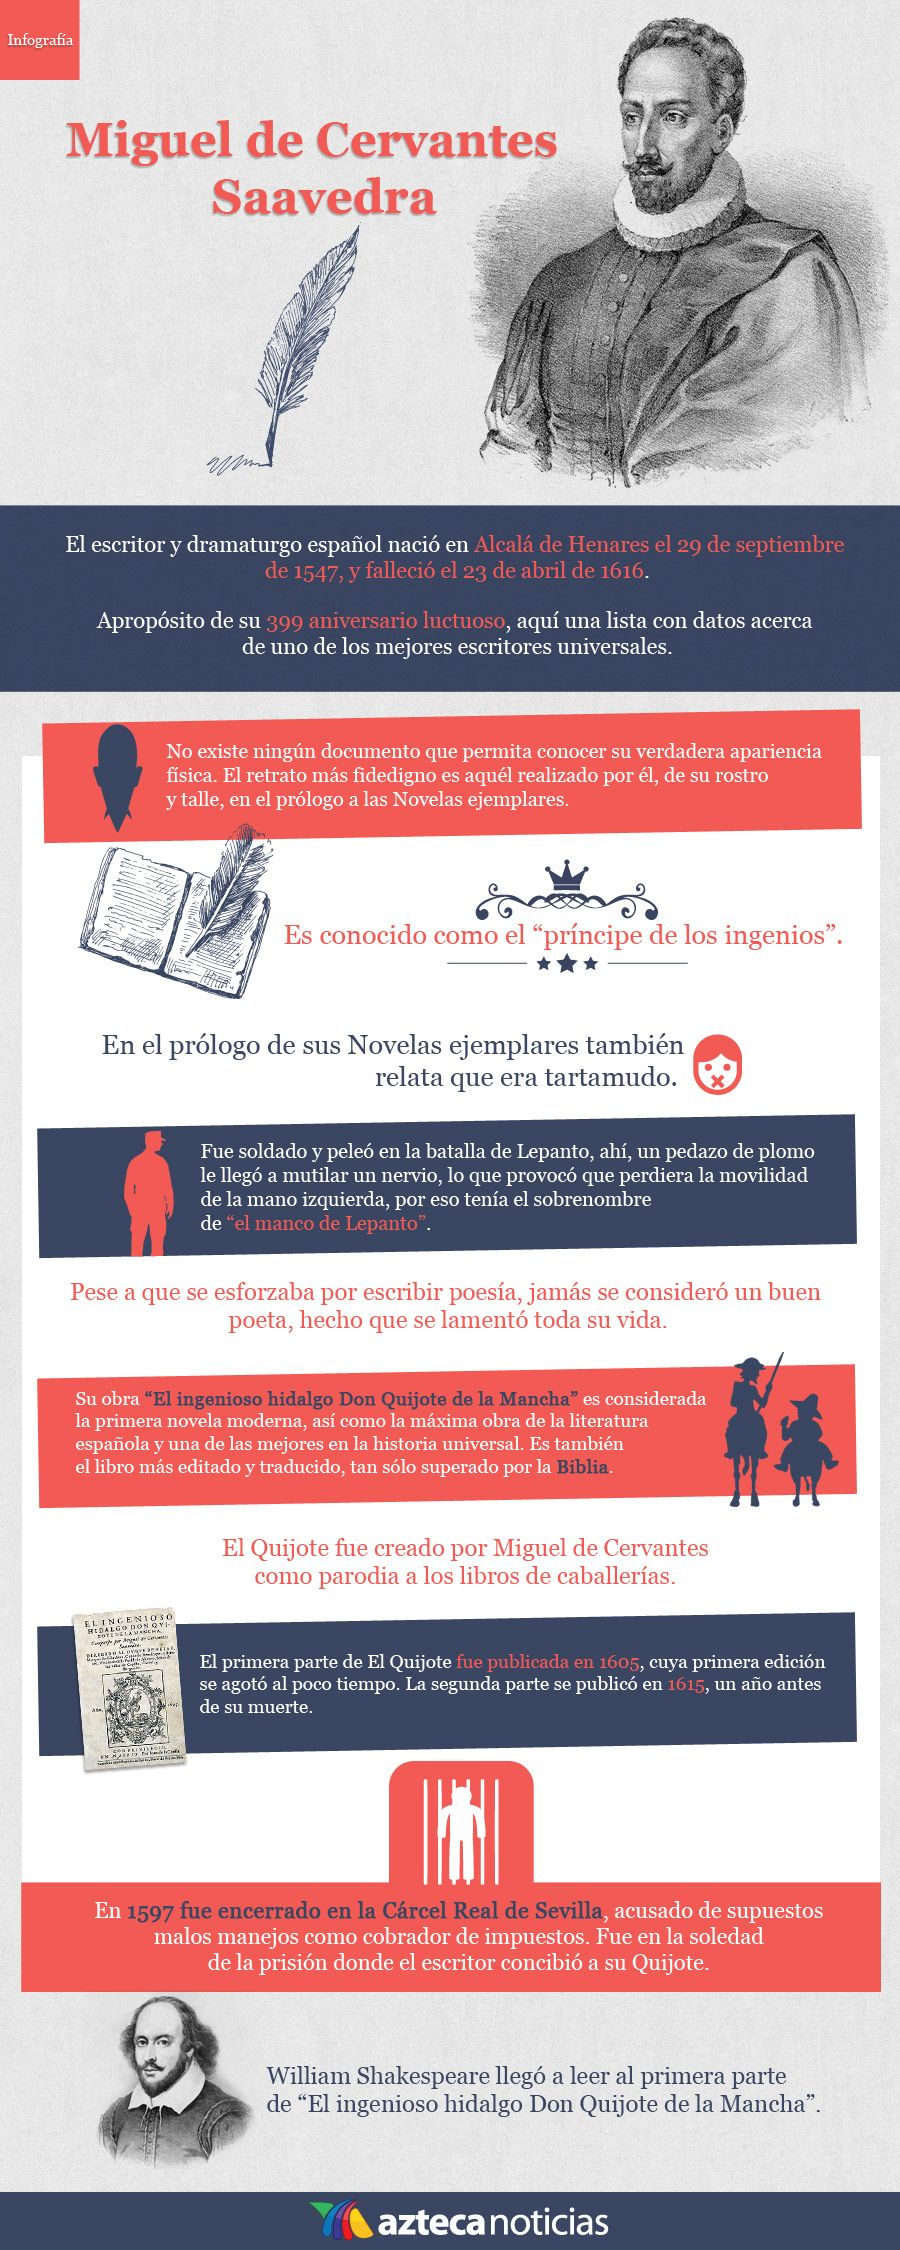 Miguel De Cervantes Saavedra Infografia Www Aztecanoticias Com Mx Ap Spanish Literature Book Writer